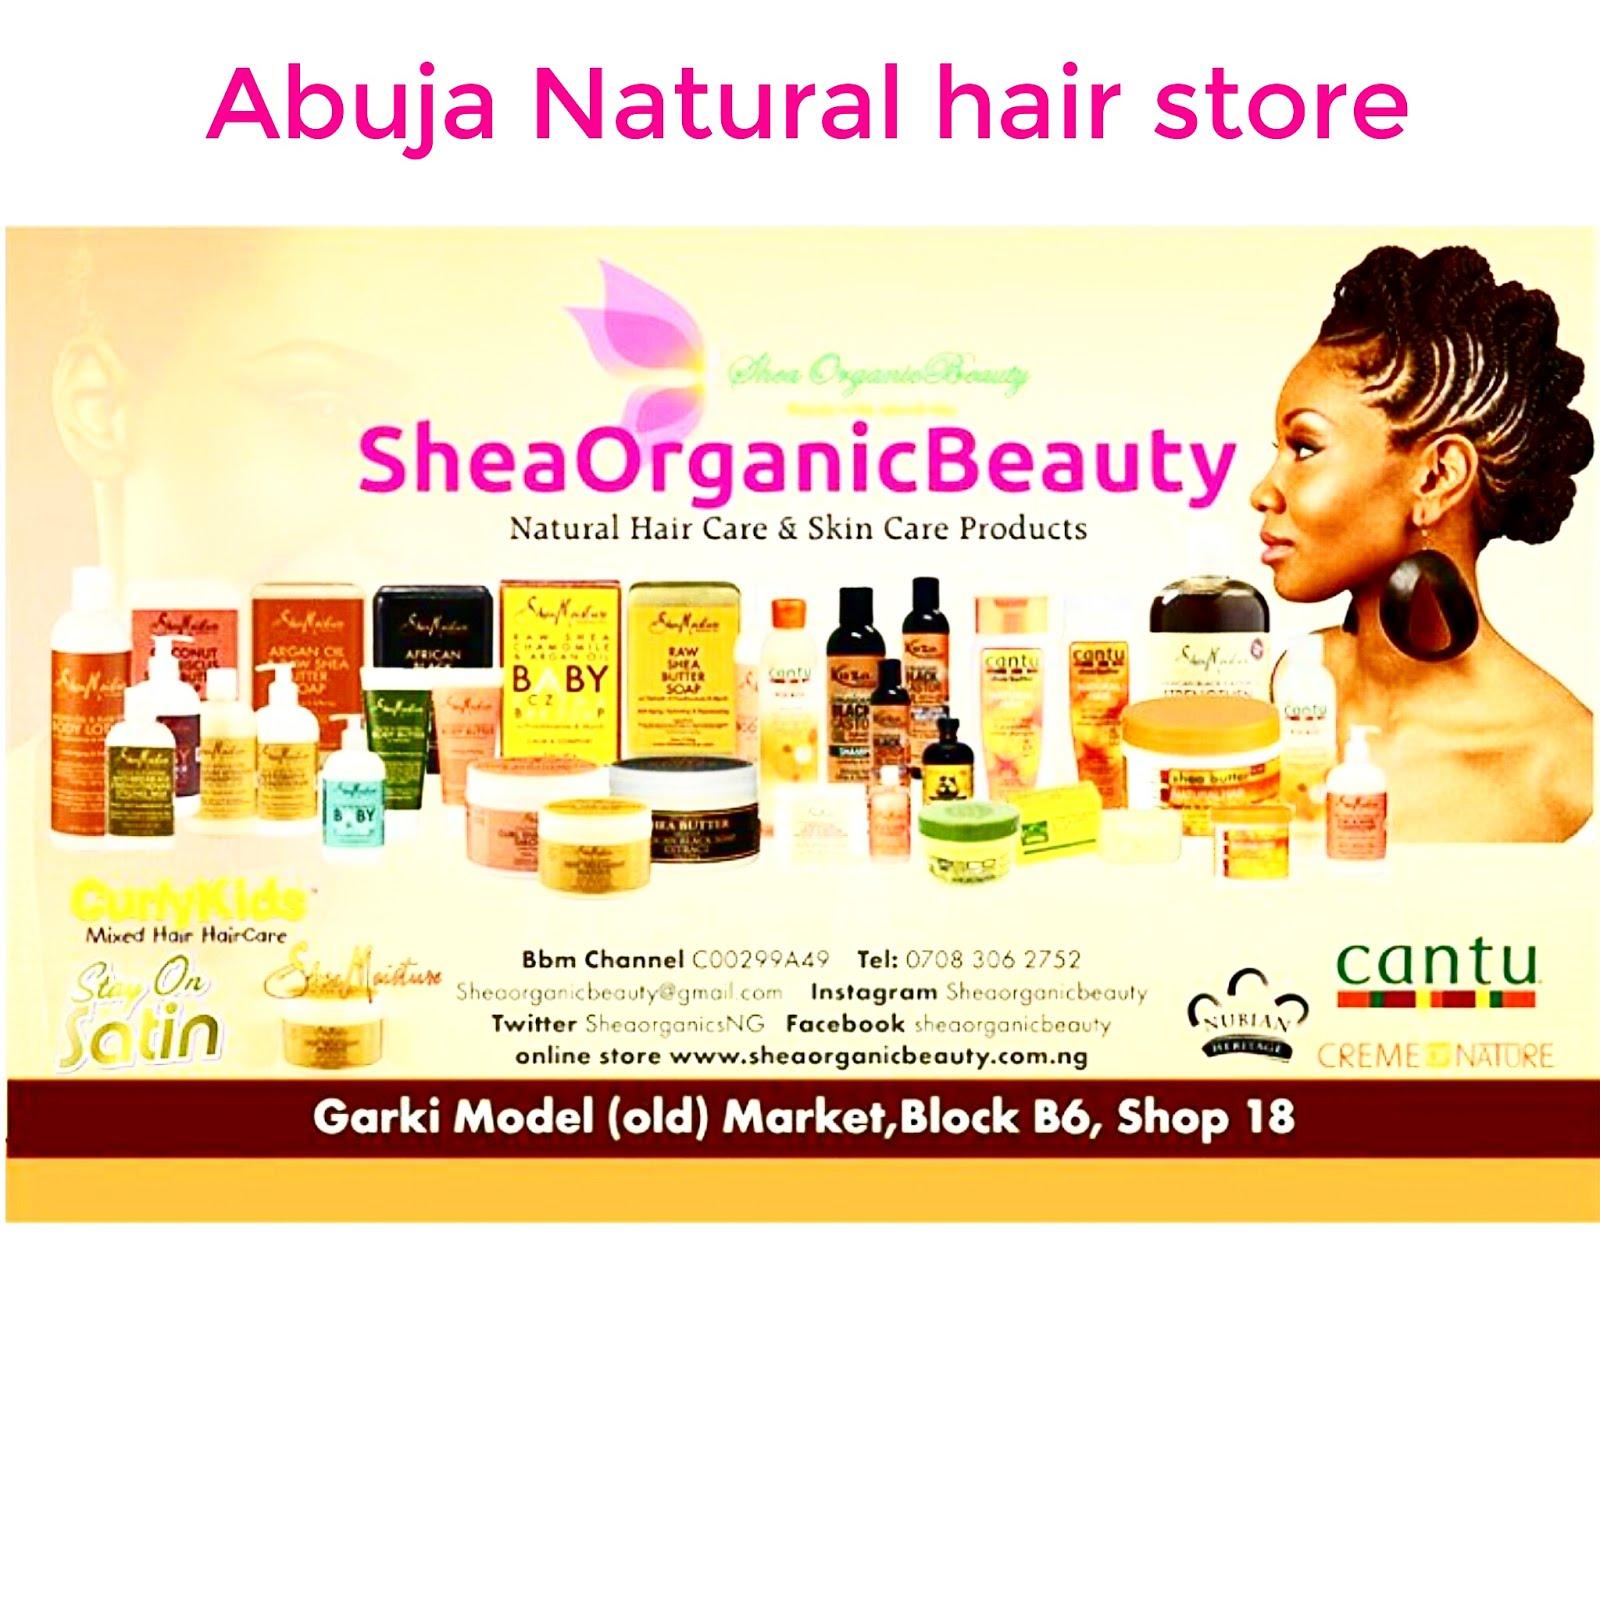 Shea Organics Beauty